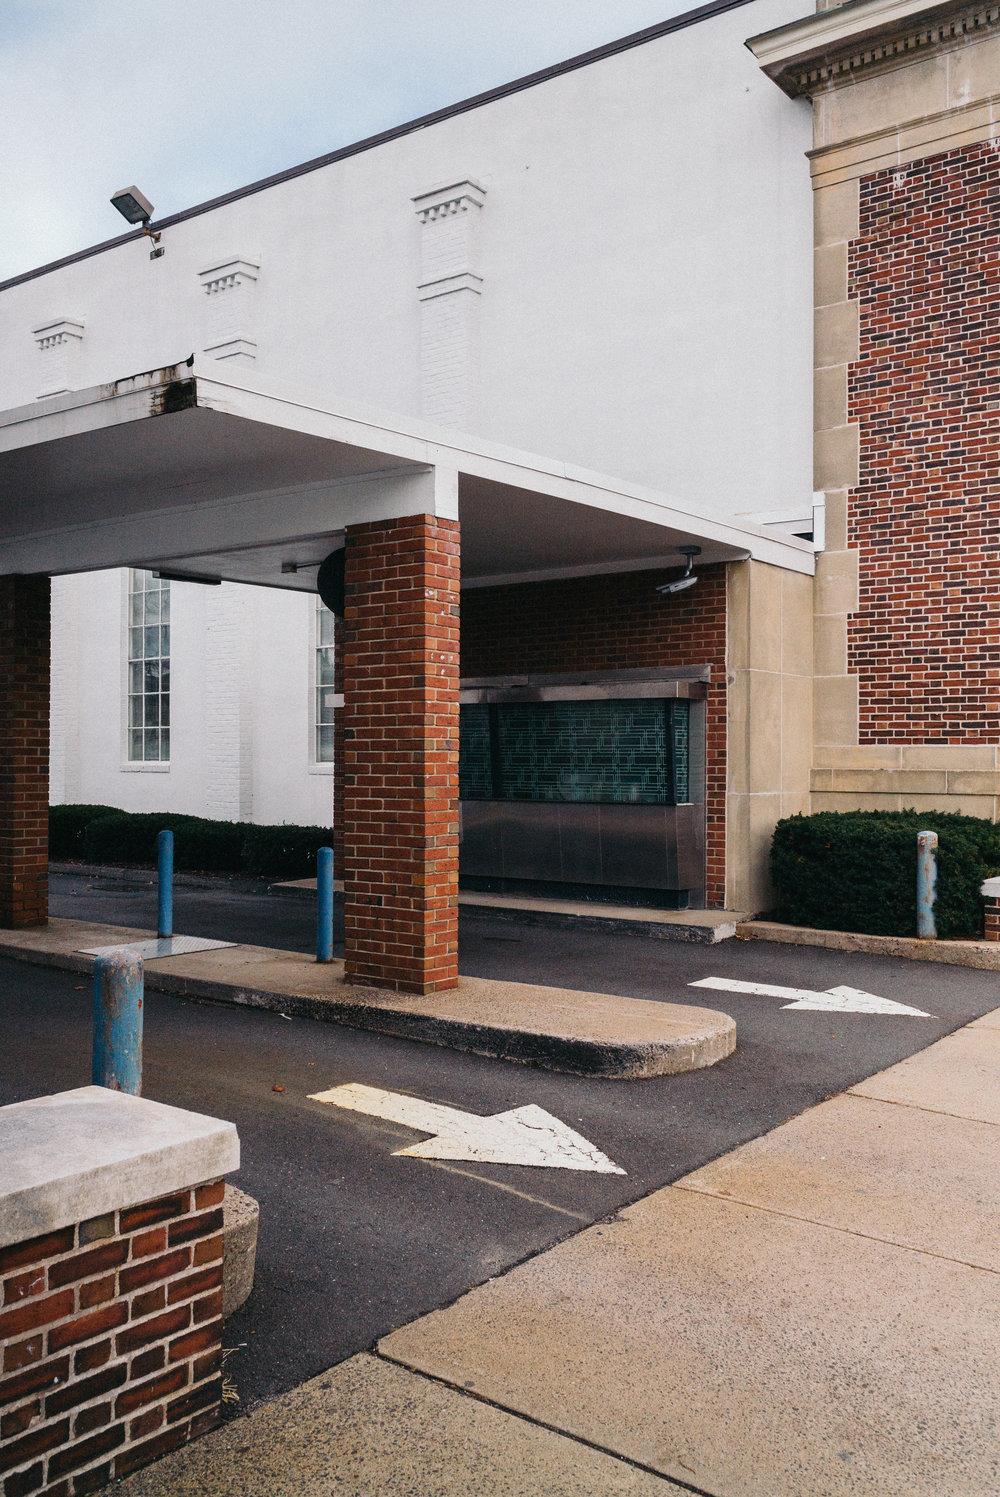 PauloLopez-Connecticut-8.jpg